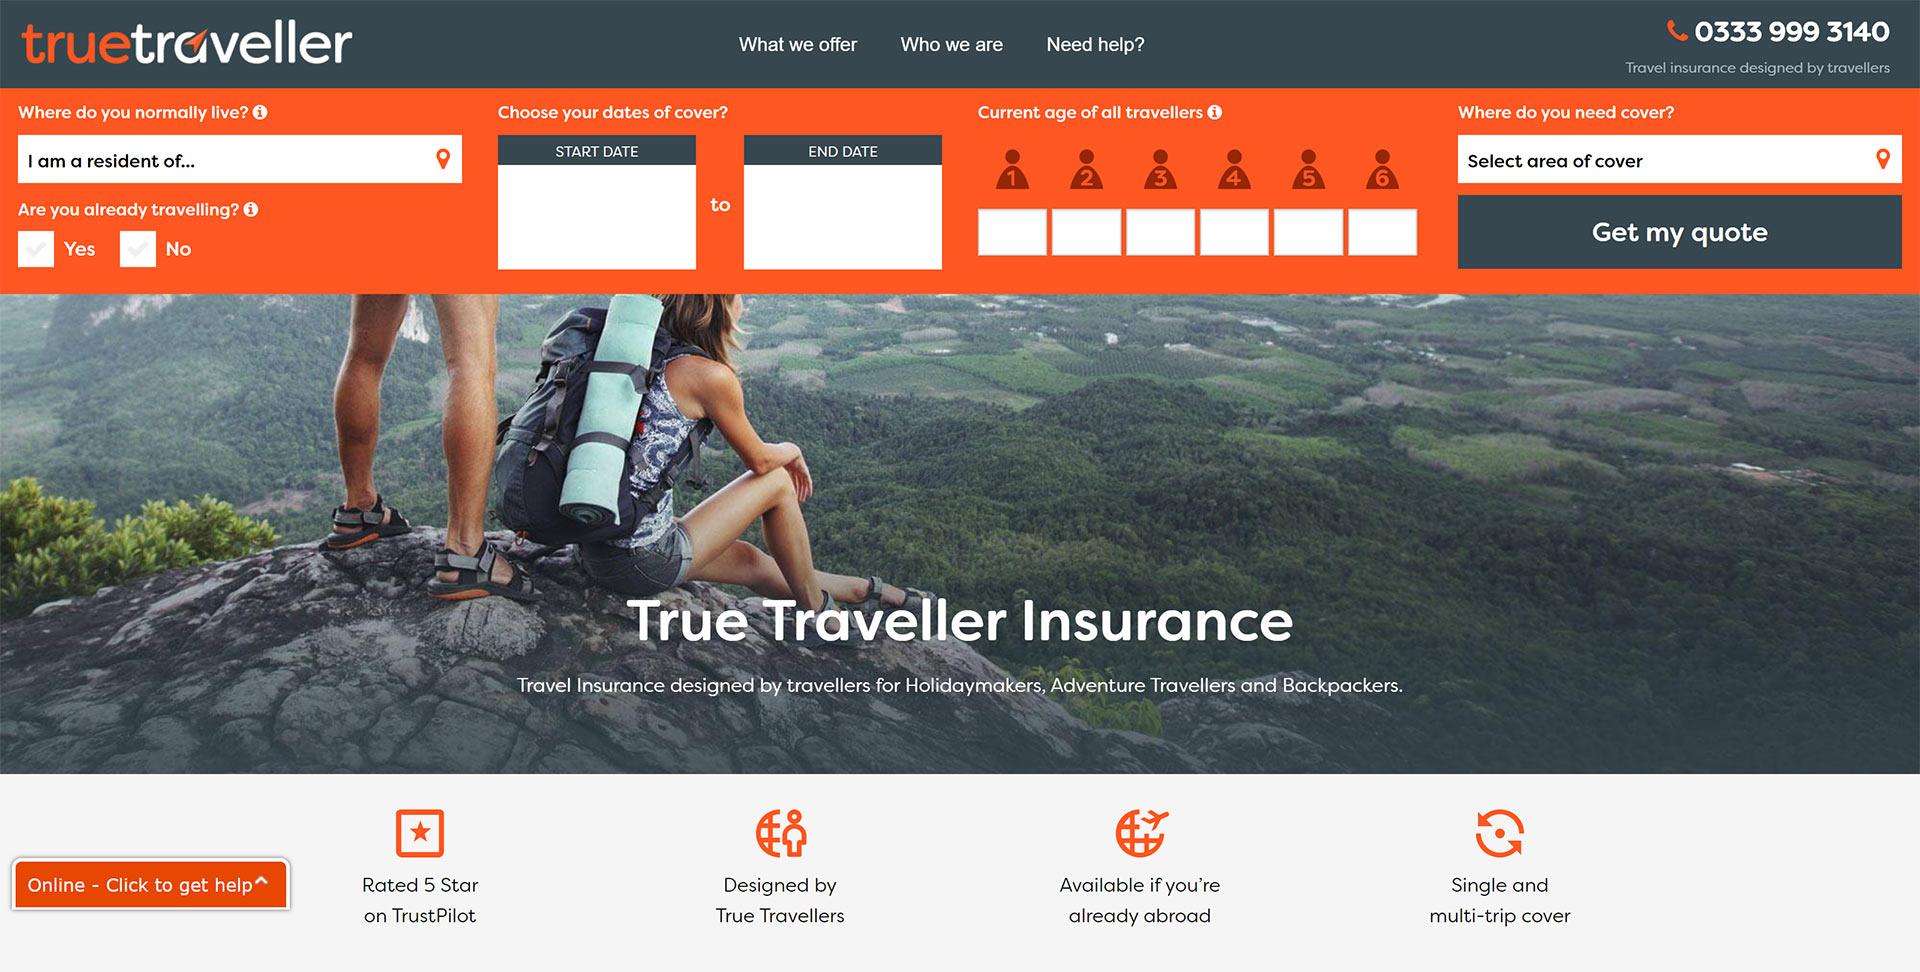 True Traveller sign-up